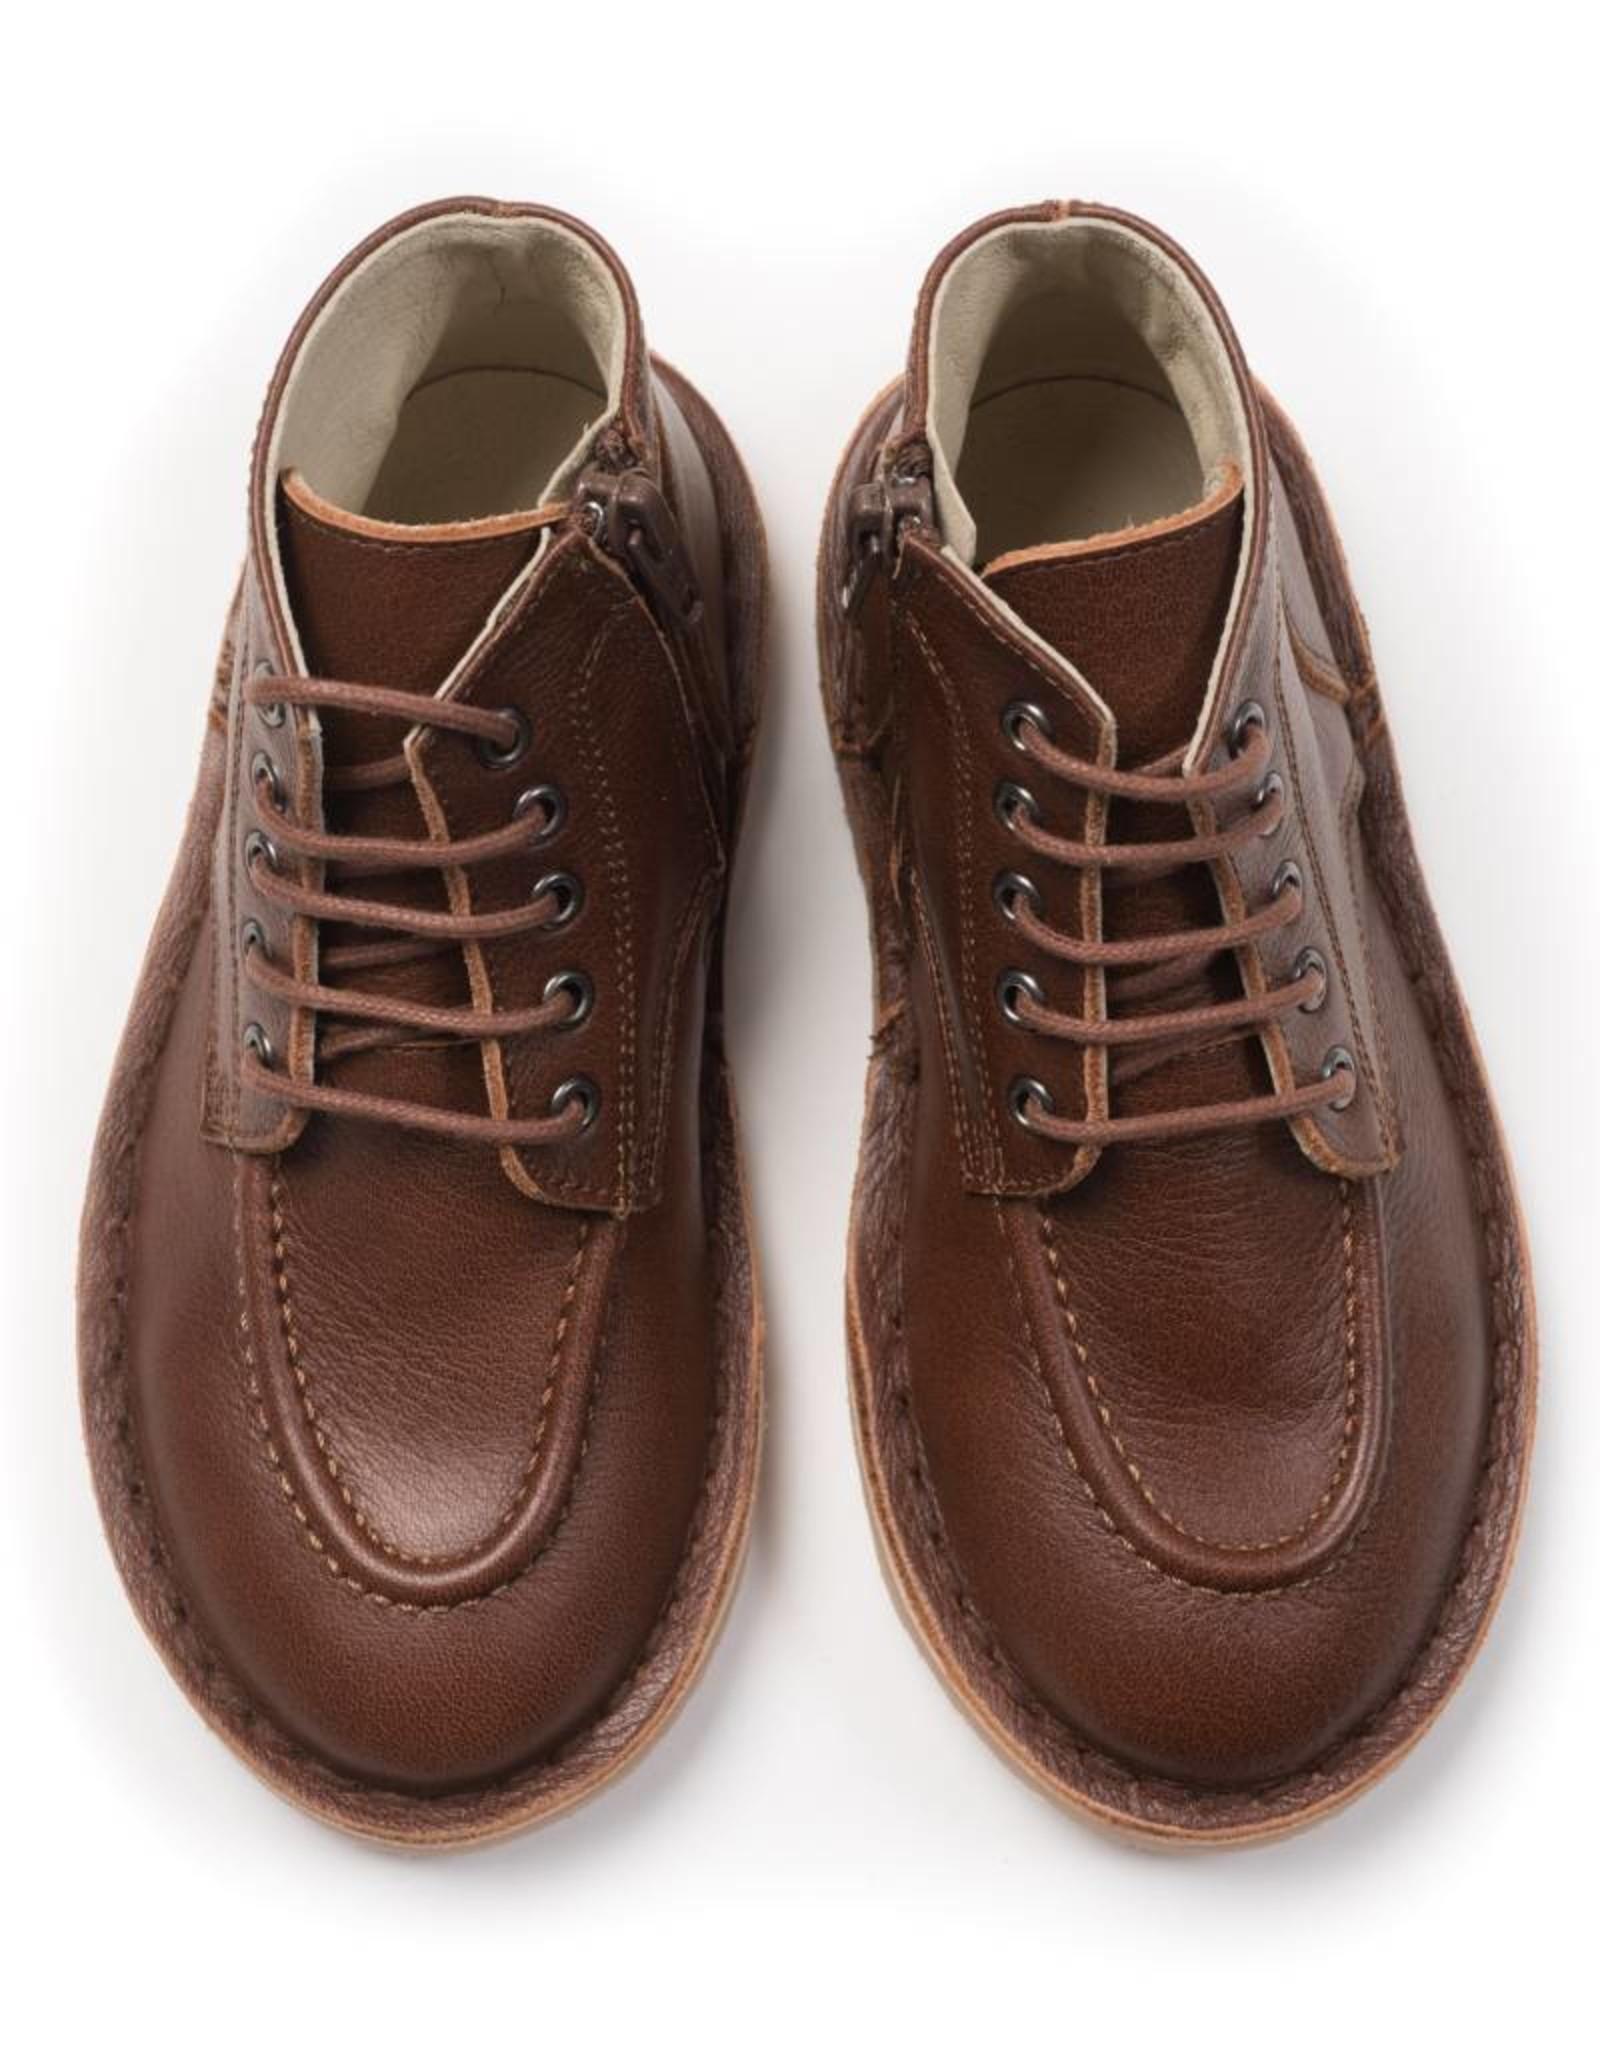 Bonton  Gaspard laced boots